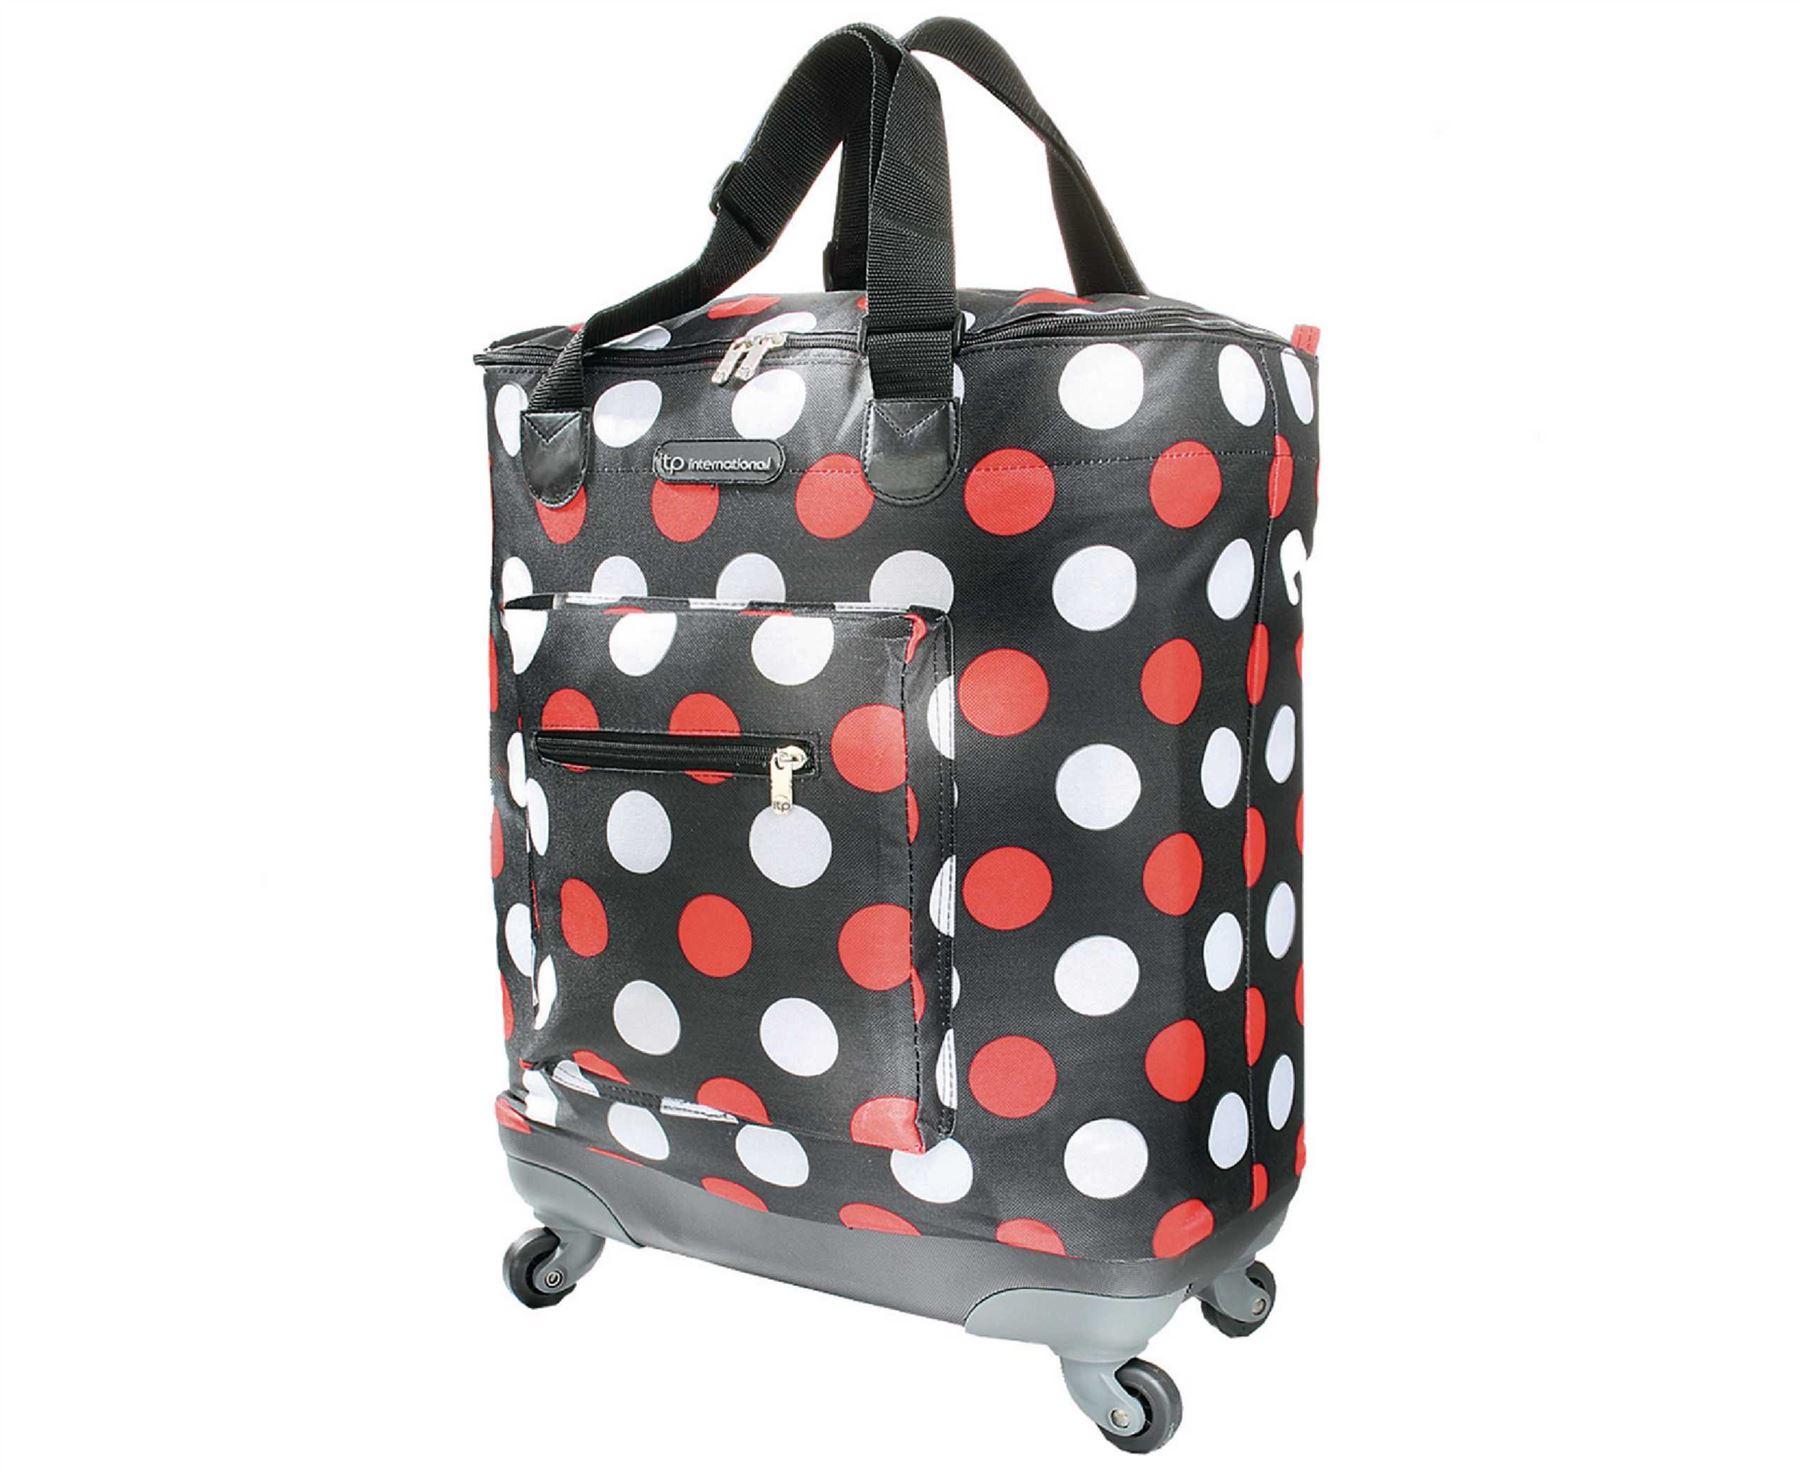 quattro lightweight folding bag on wheels shopping trips. Black Bedroom Furniture Sets. Home Design Ideas